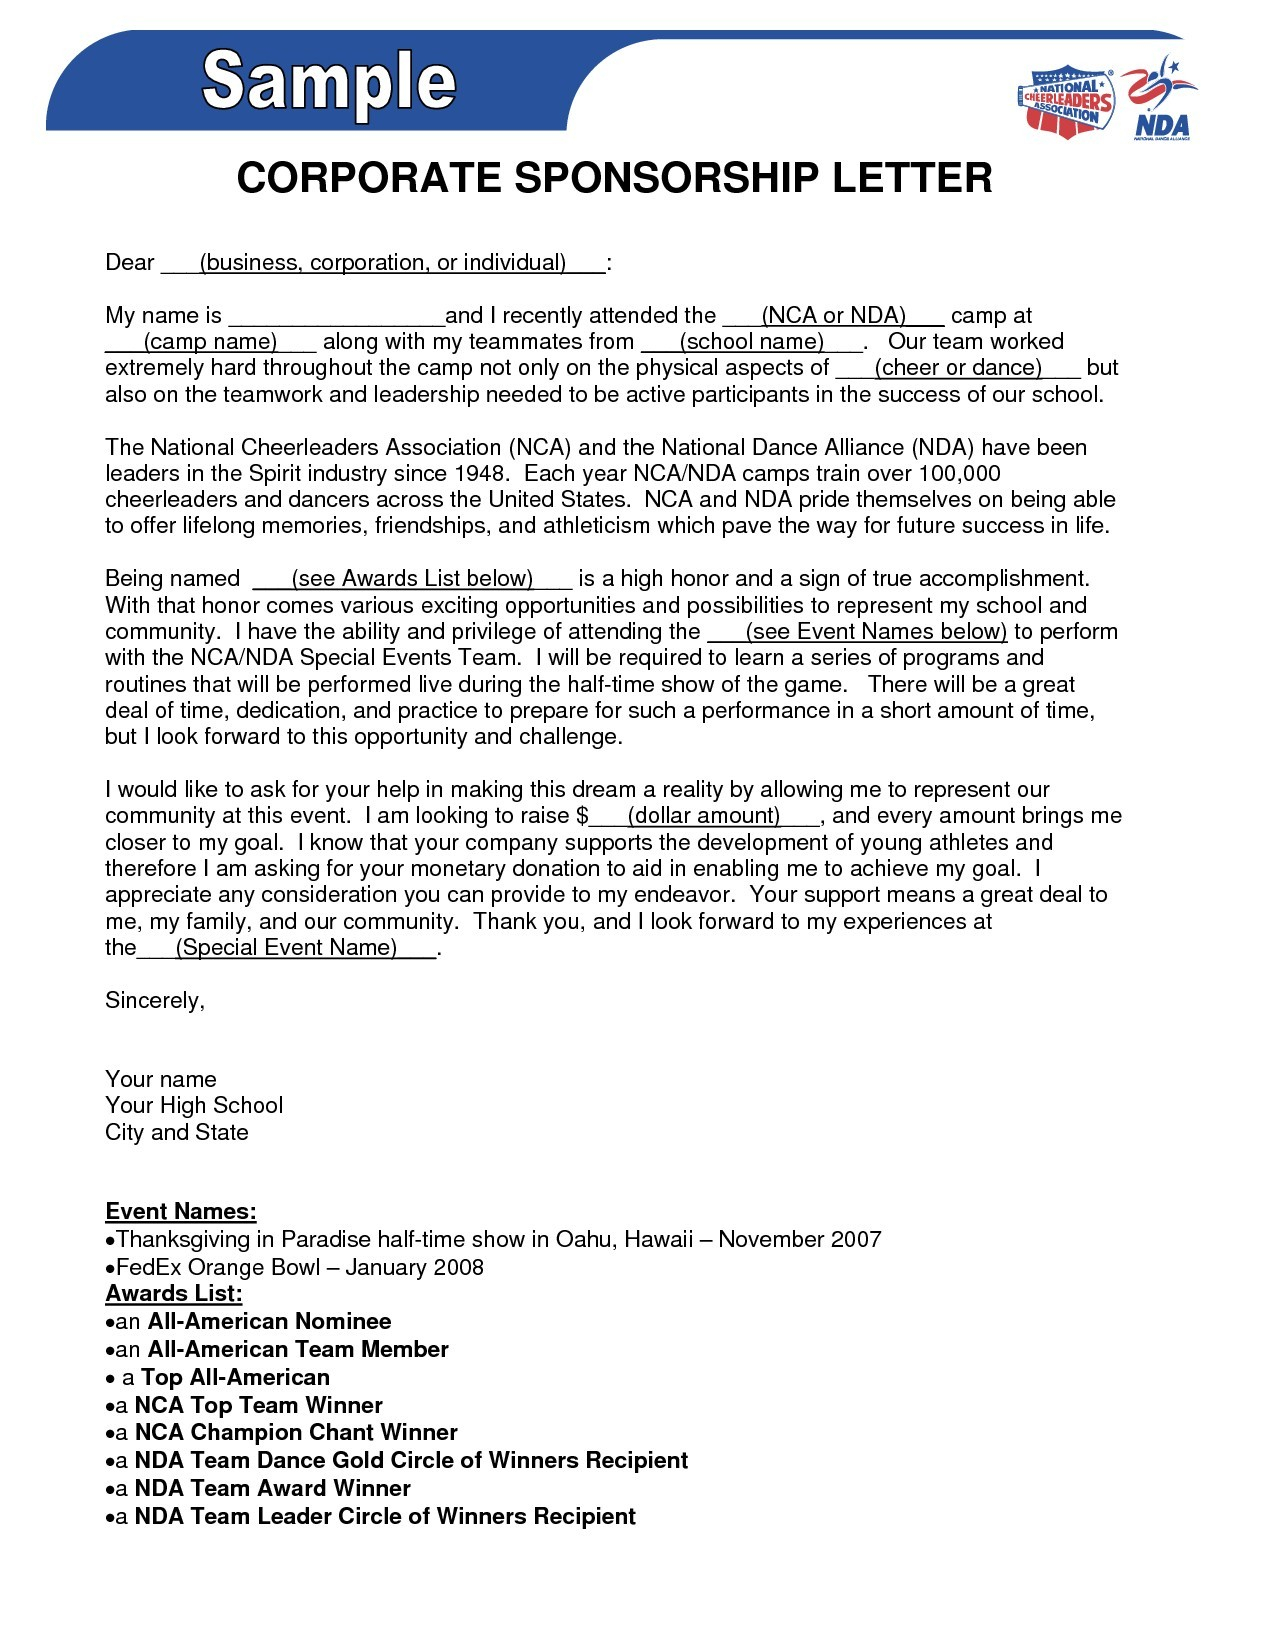 School Sponsorship Letter Template - Sponsorship Request Letter Pdf Best Sample Corporate Sponsorship